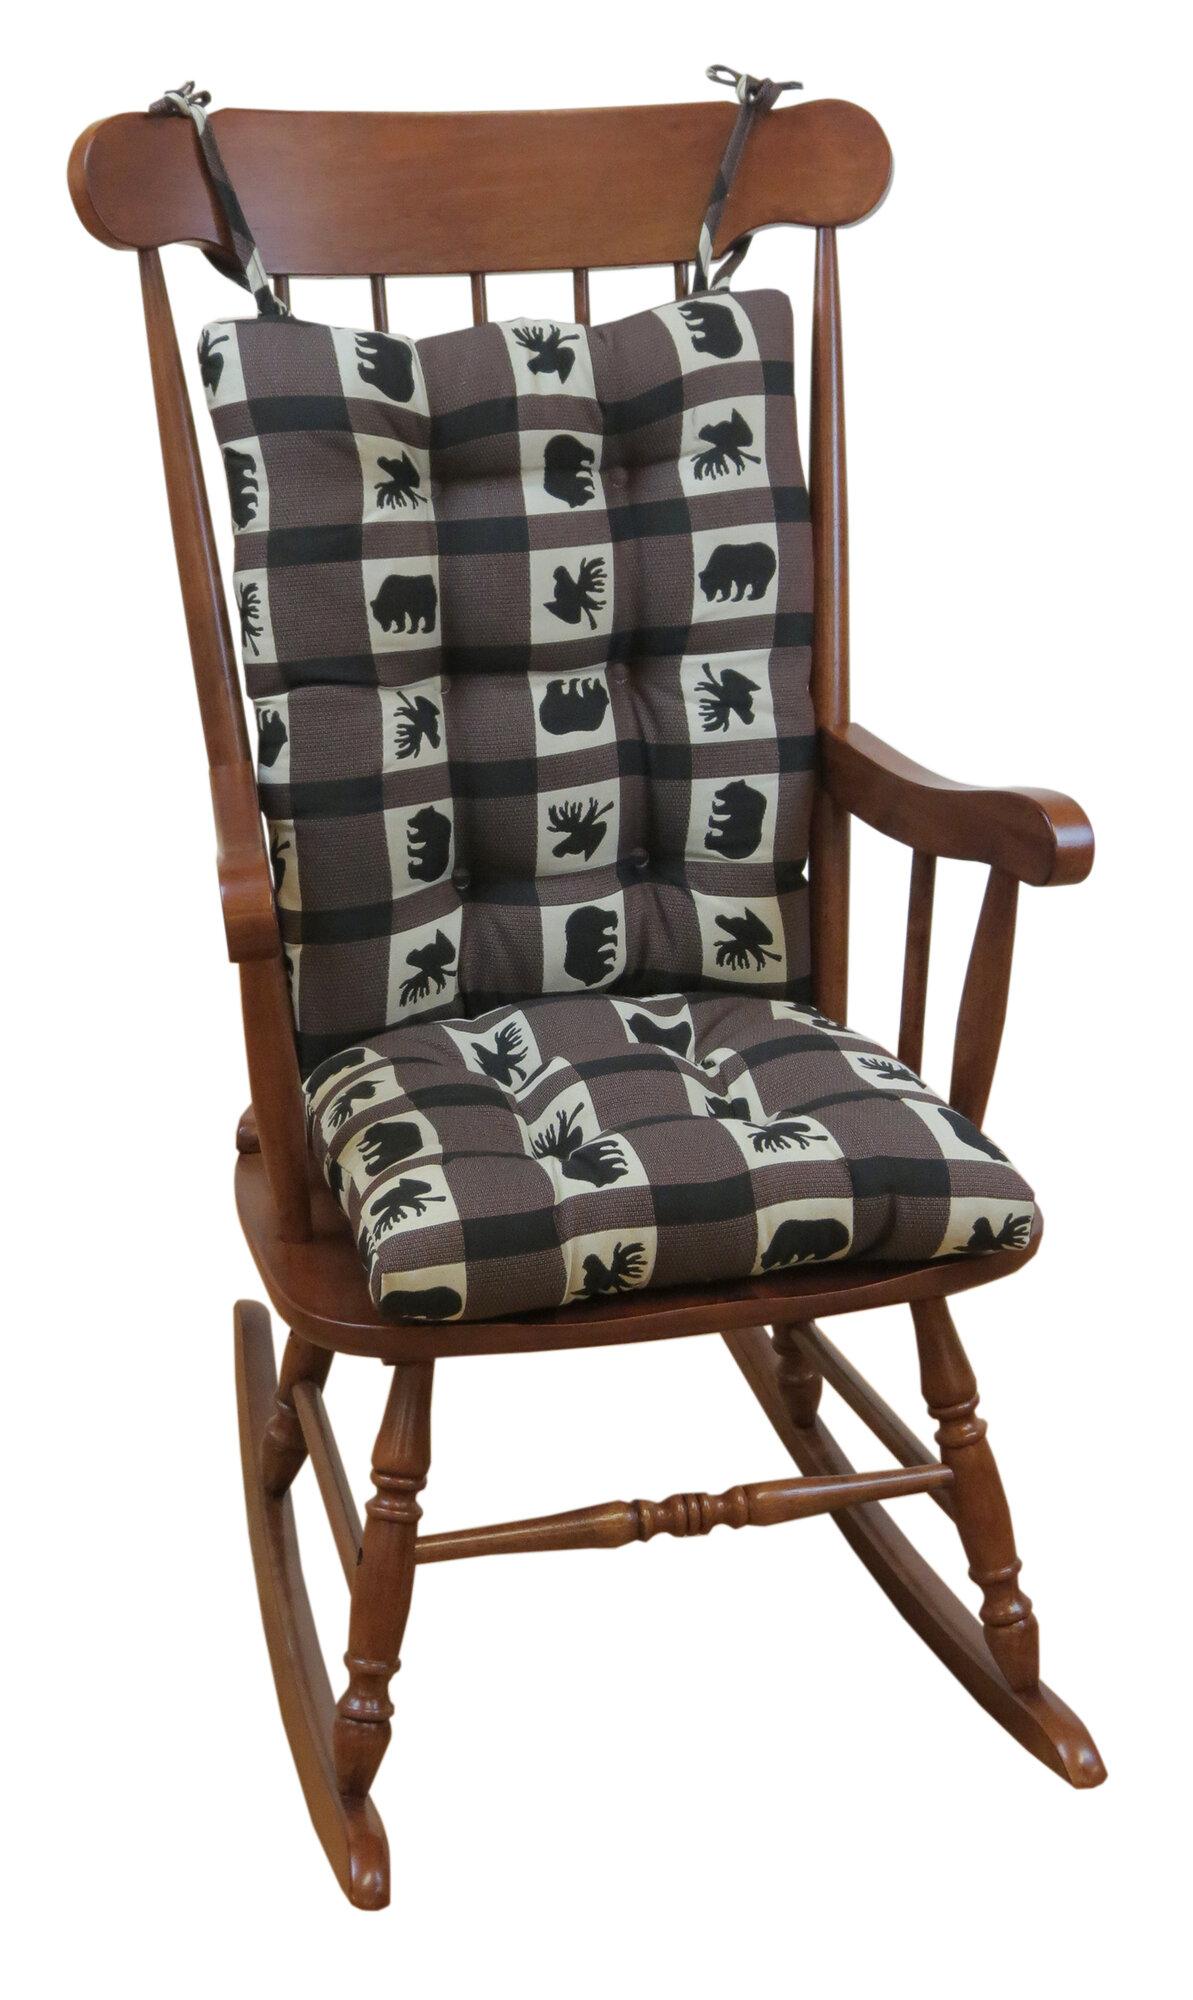 Klear Vu Lodge Animal Plaid Gripper Jumbo Rocking Chair Cushion  eBay